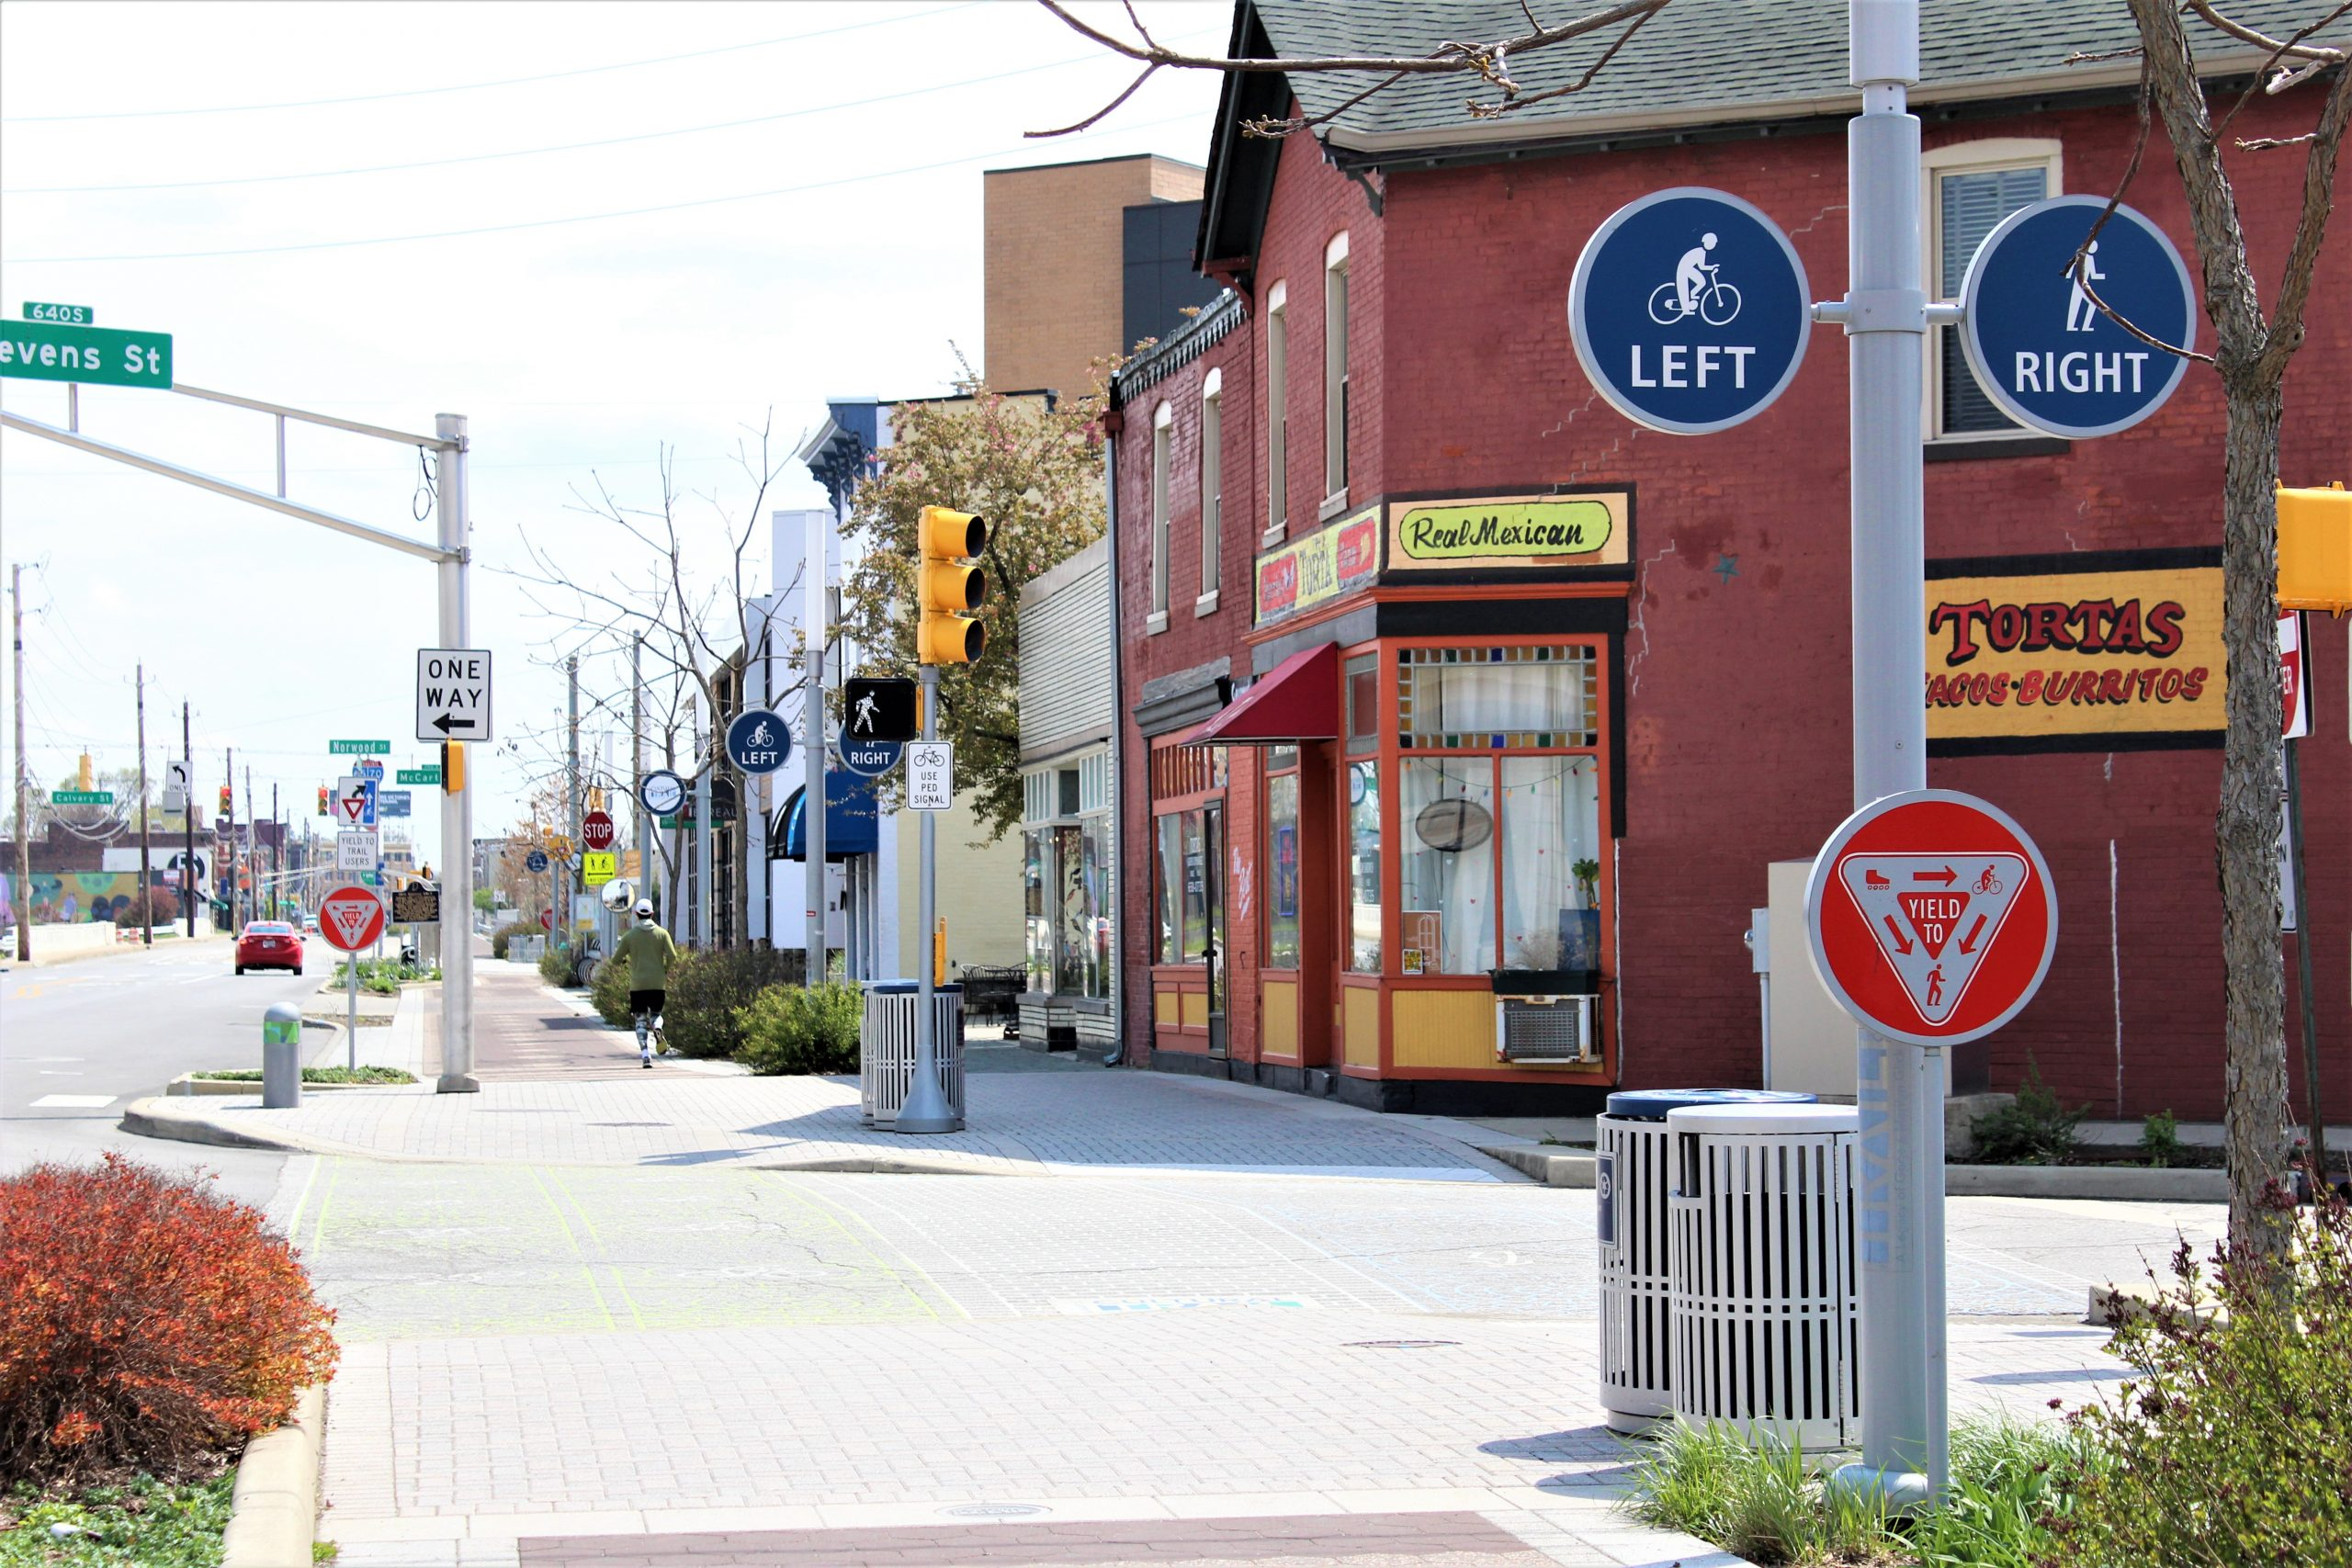 Fletcher Place Neighborhood Cultural trail, Tortas and Calvin Fletchers Coffee